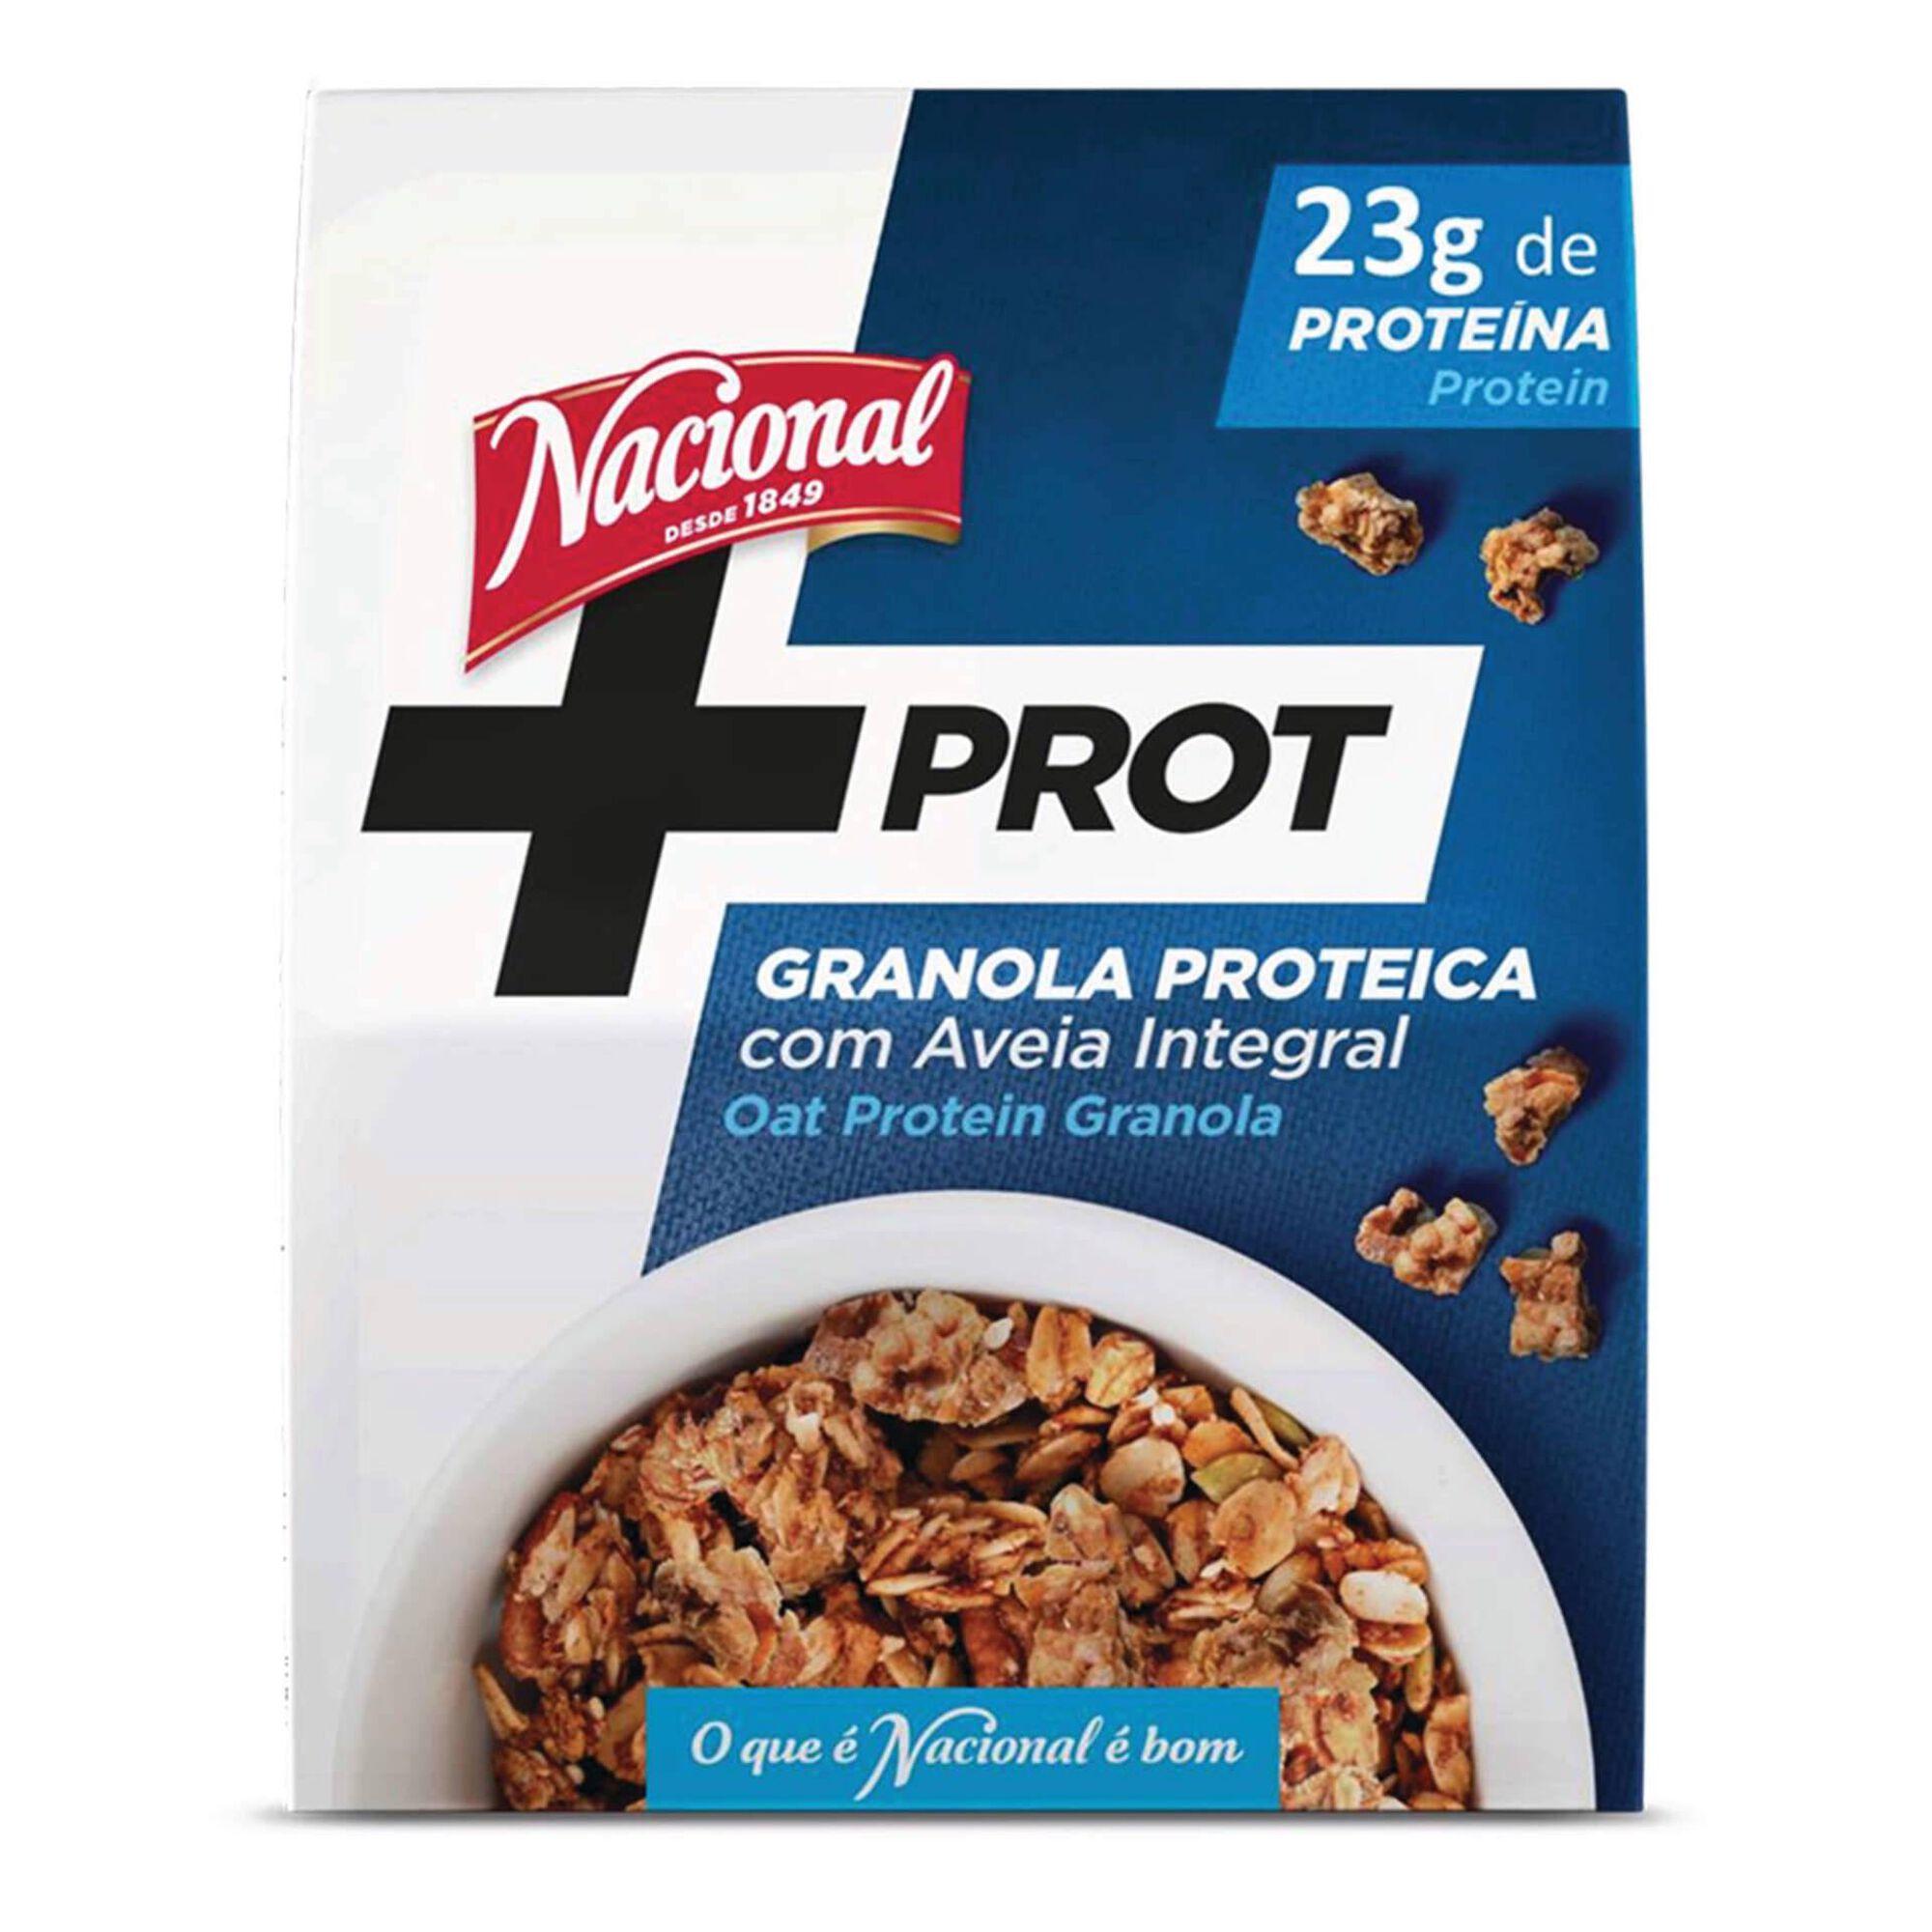 Granola Proteica